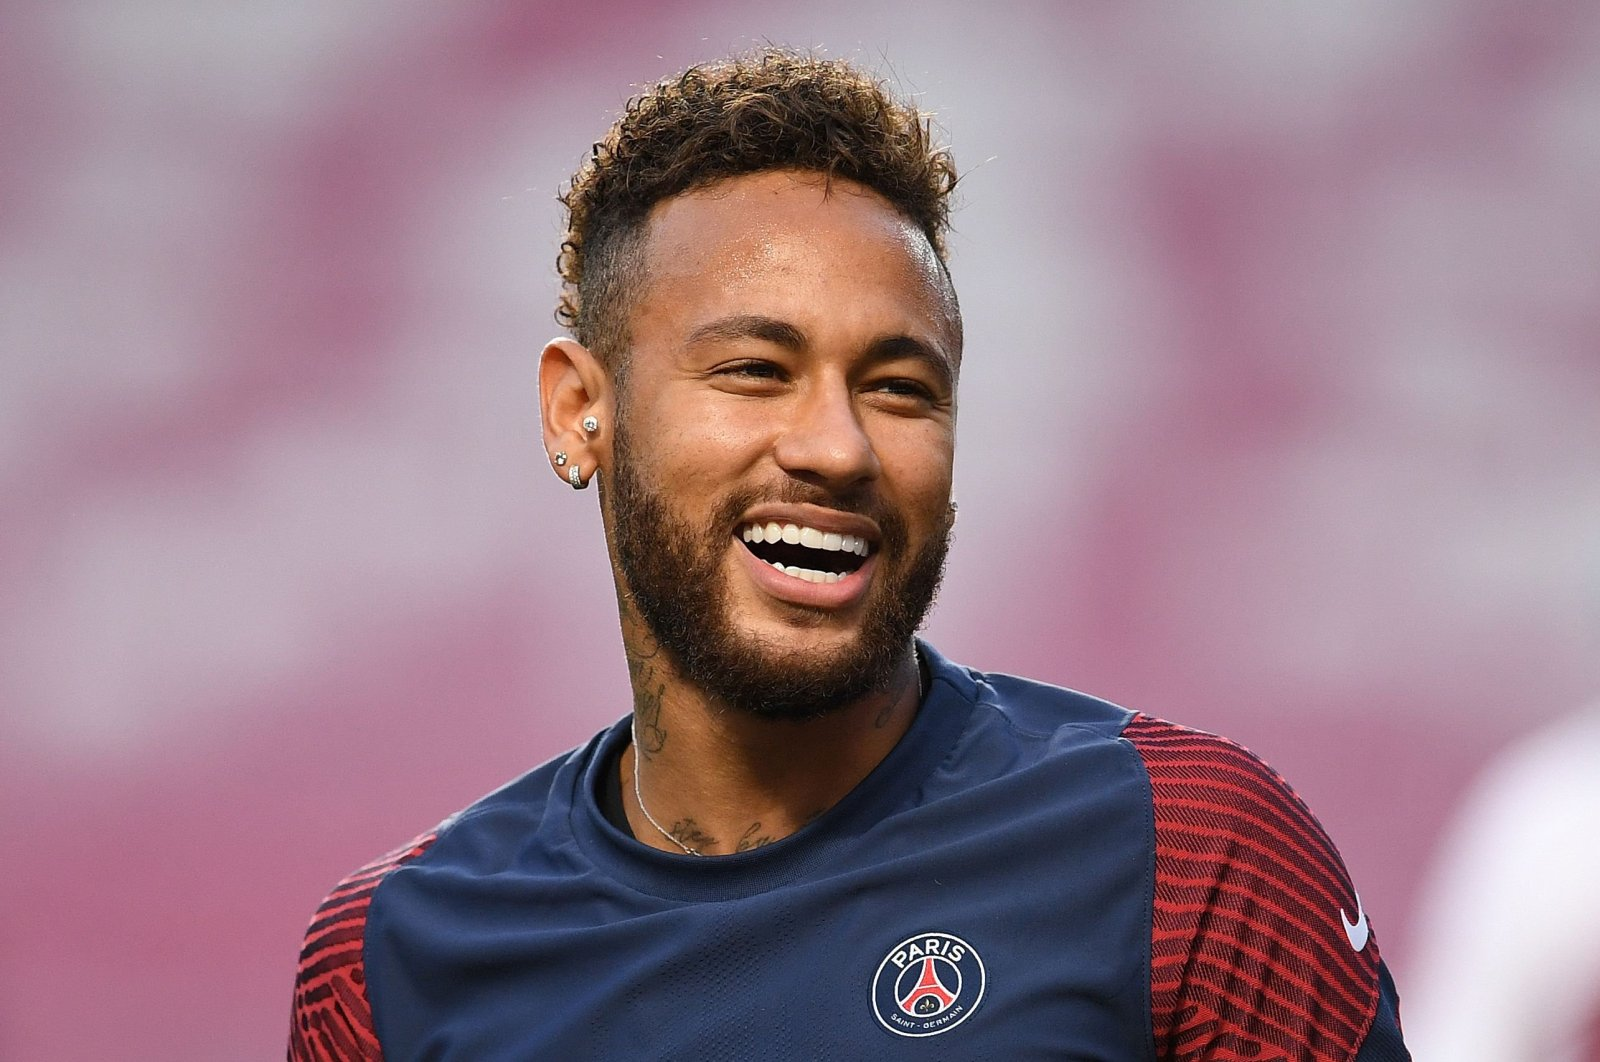 Paris Saint-Germain's Brazilian forward Neymar reacts during a training session on the eve of UEFA Champions League final football match between Paris Saint-Germain and Bayern Munich, at the Luz stadium in Lisbon, Aug. 22, 2020. (AFP Photo)